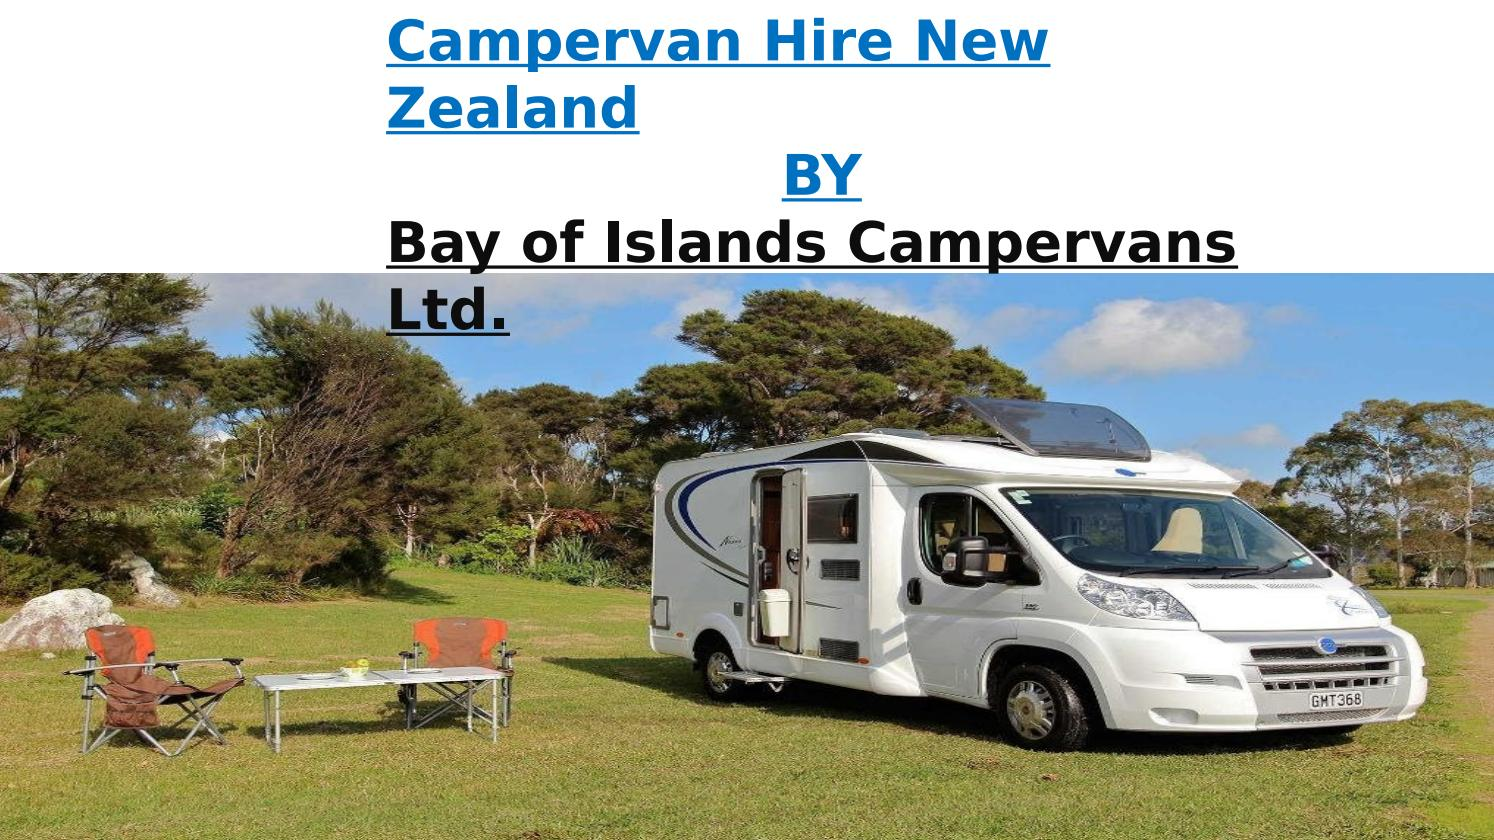 Campervan Hire New Zealand by Bay of Islands Campervans - issuu